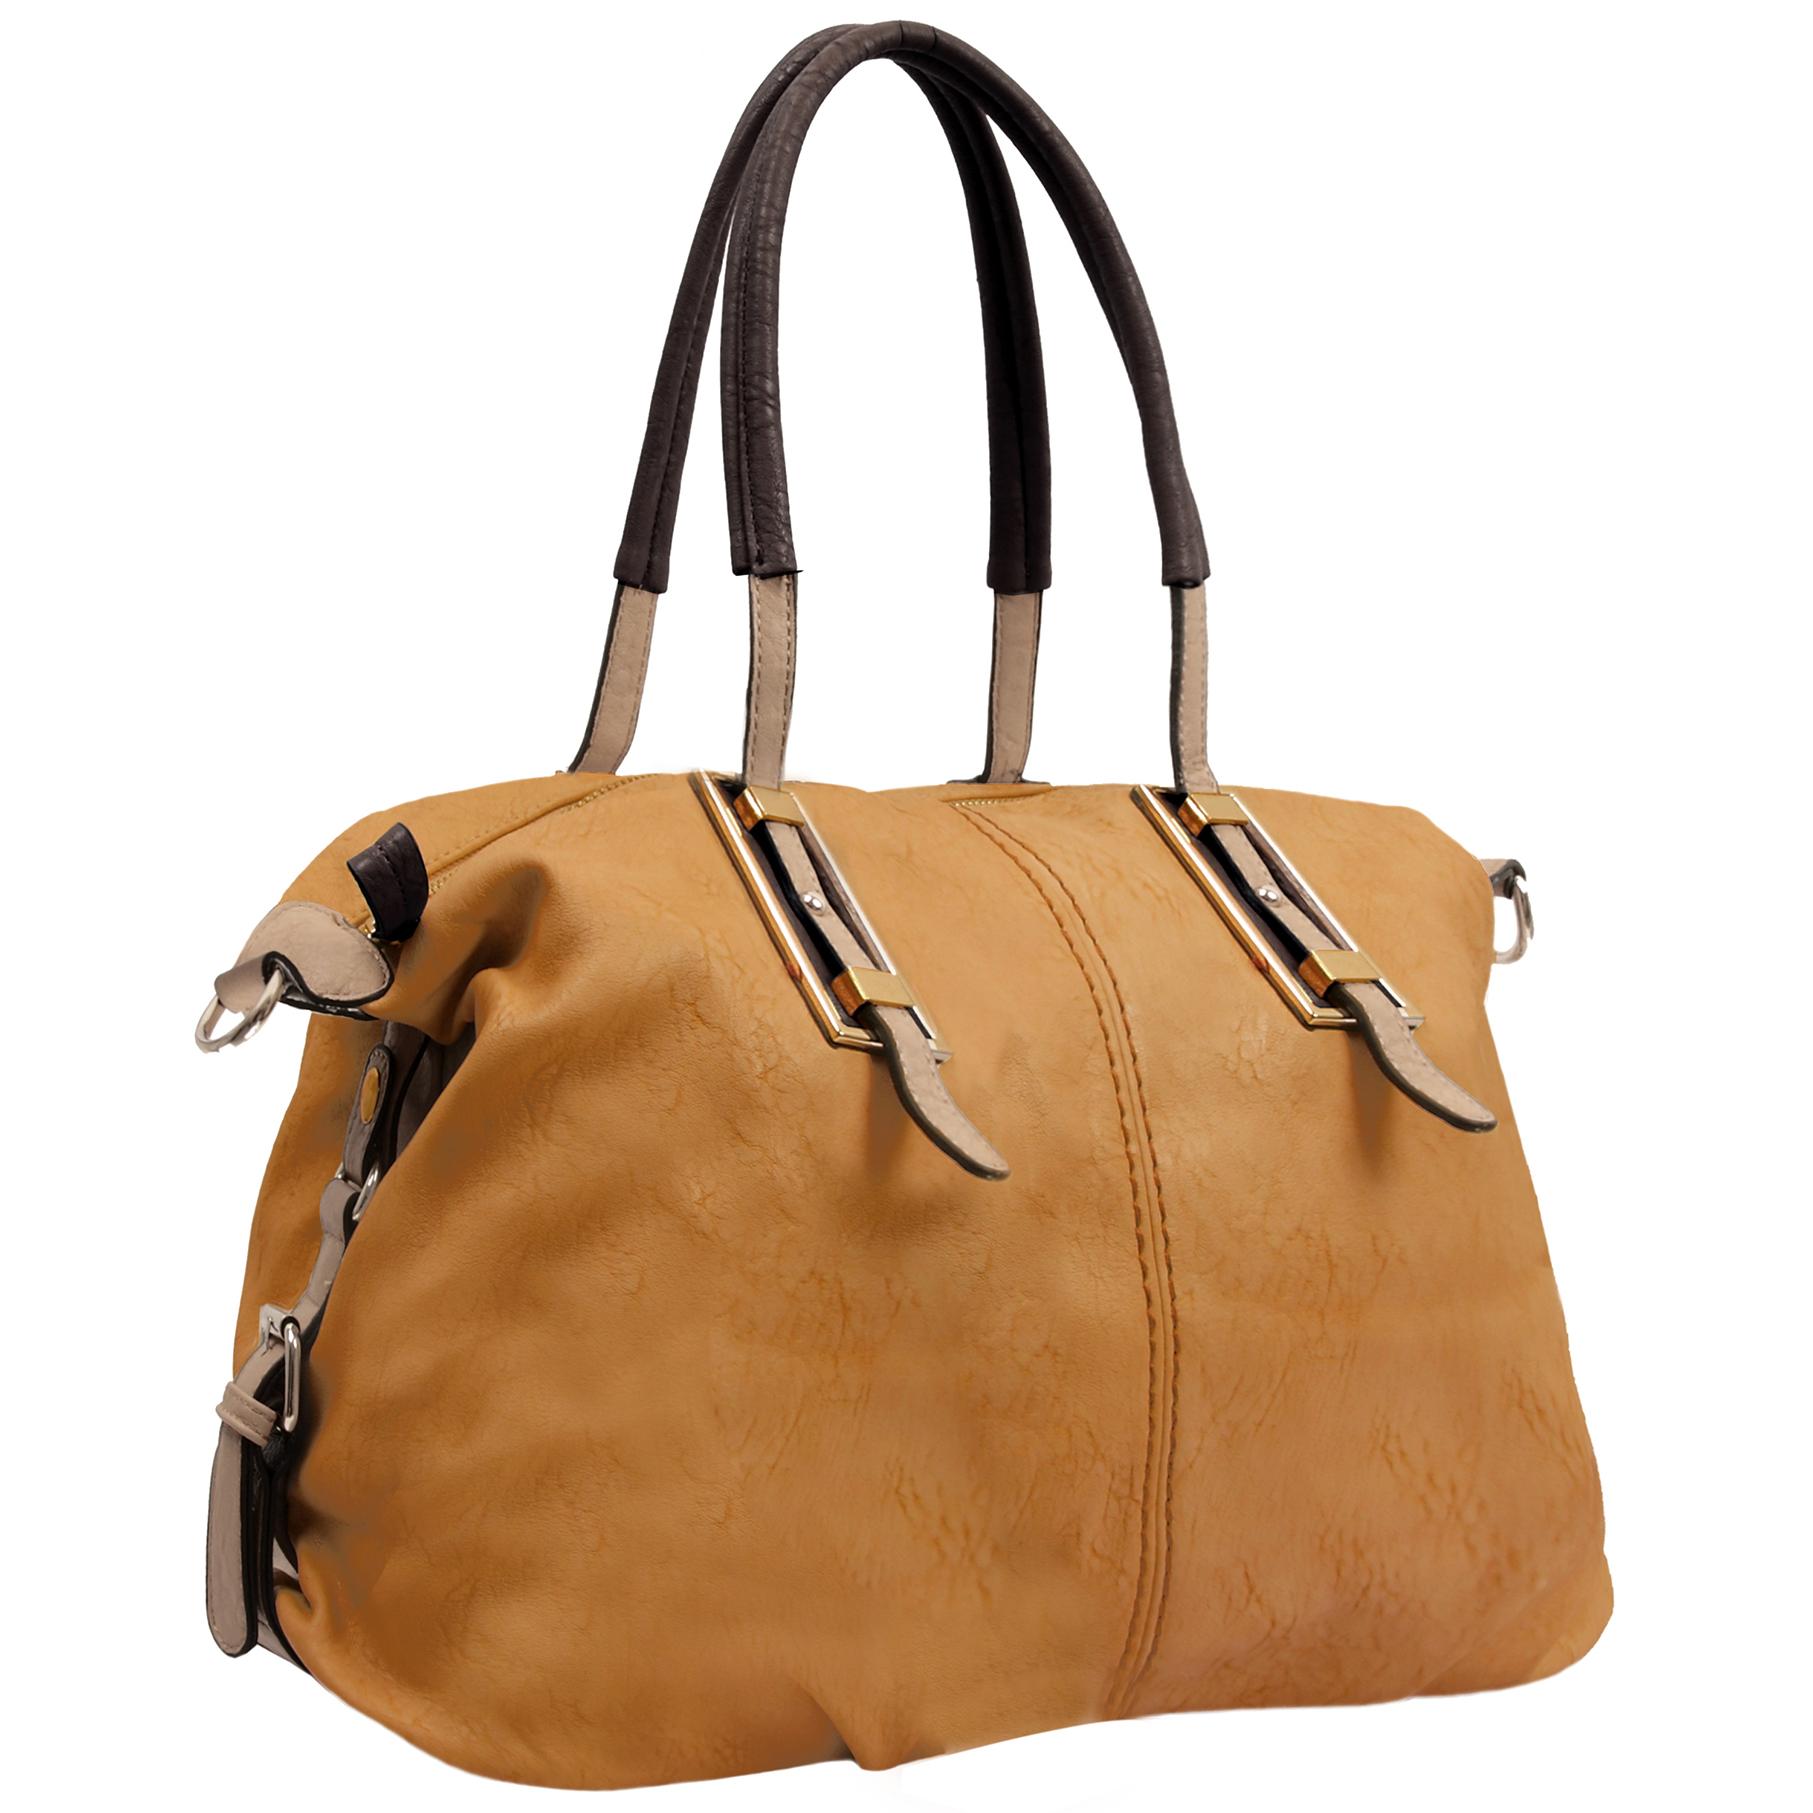 ACACIA Caramel Large Everyday Shopper Hobo Handbag Main